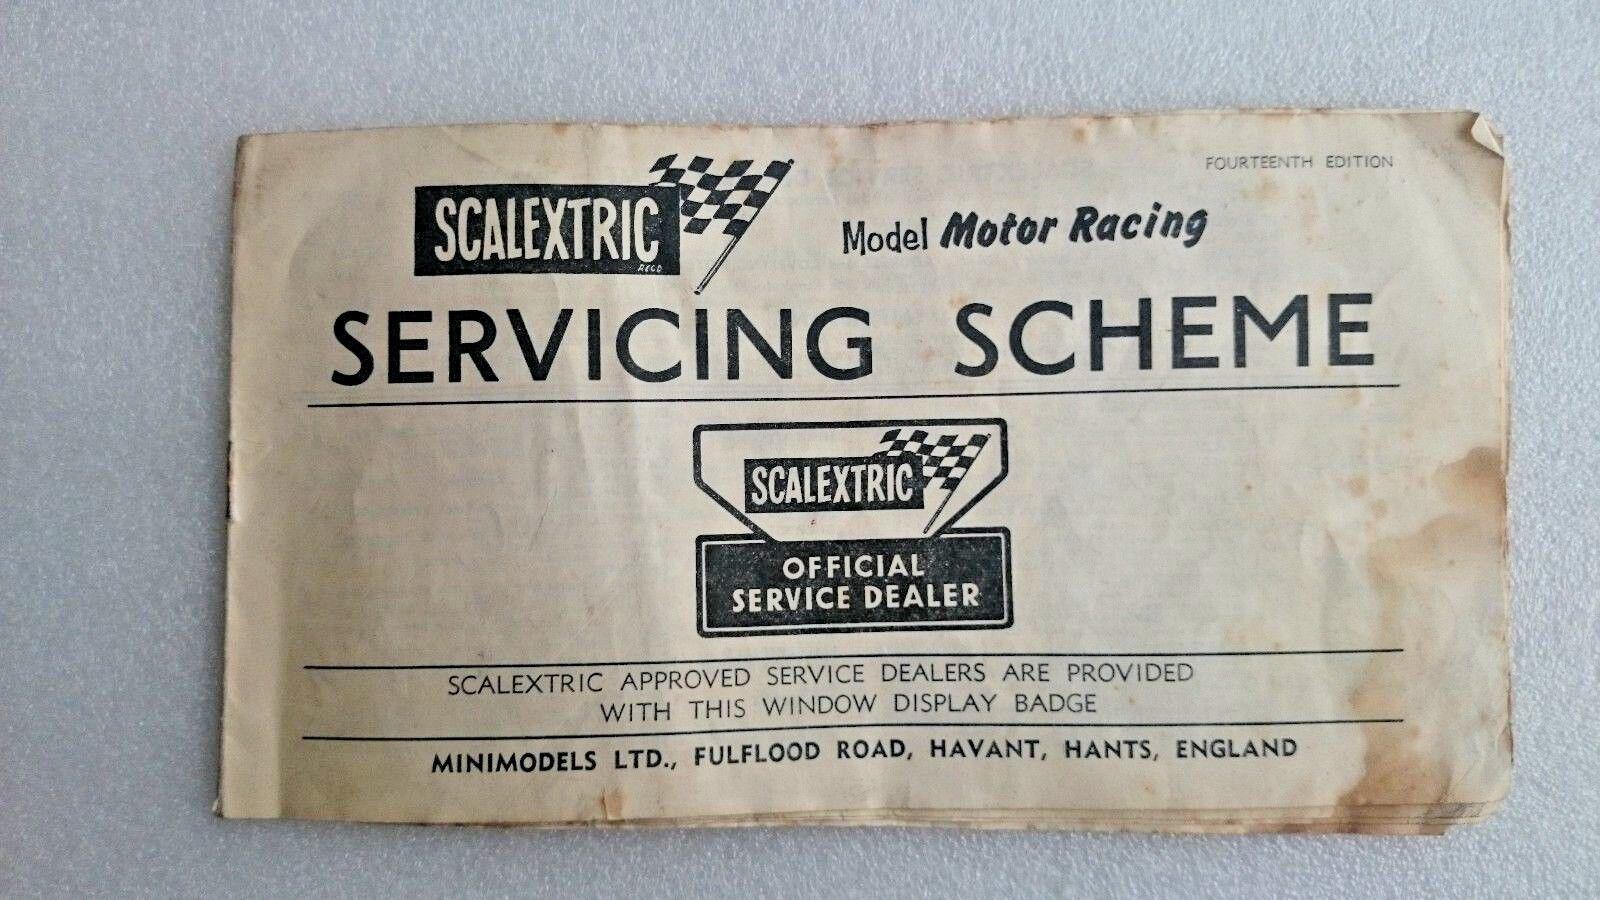 VINTAGE SCALEXTRIC Model Motor Racing Booklet SERVICE DEALER SCHEME 1960s